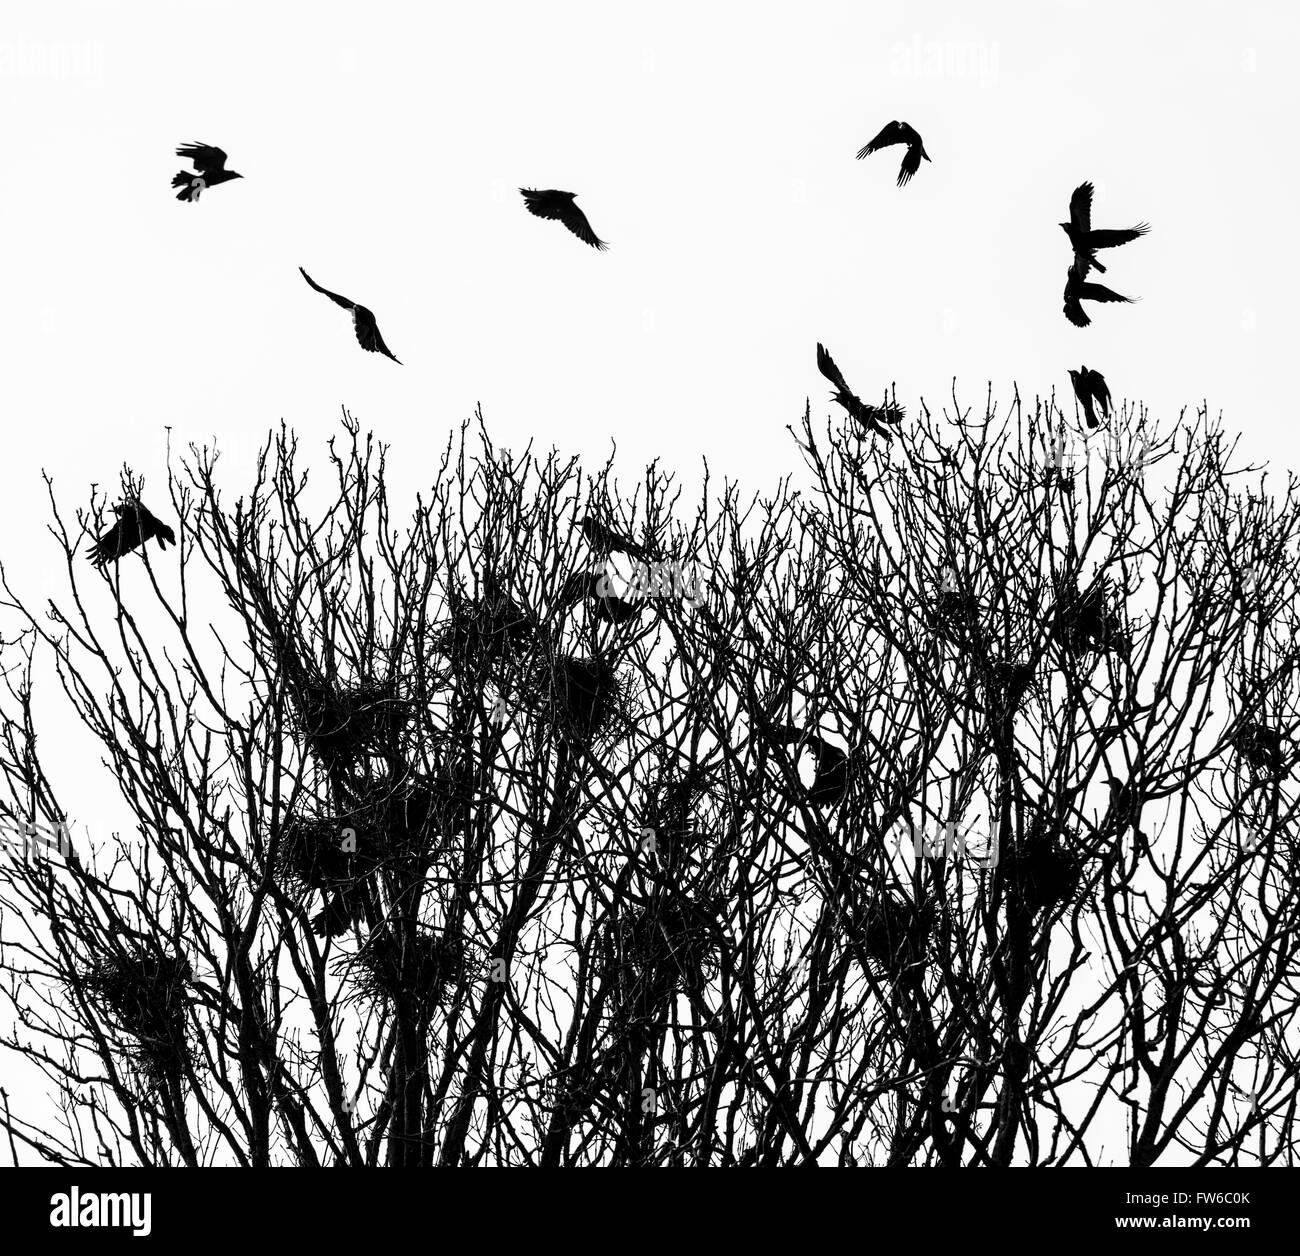 Saatkrähen beschäftigt tendenziell ihre Nester. Stockbild